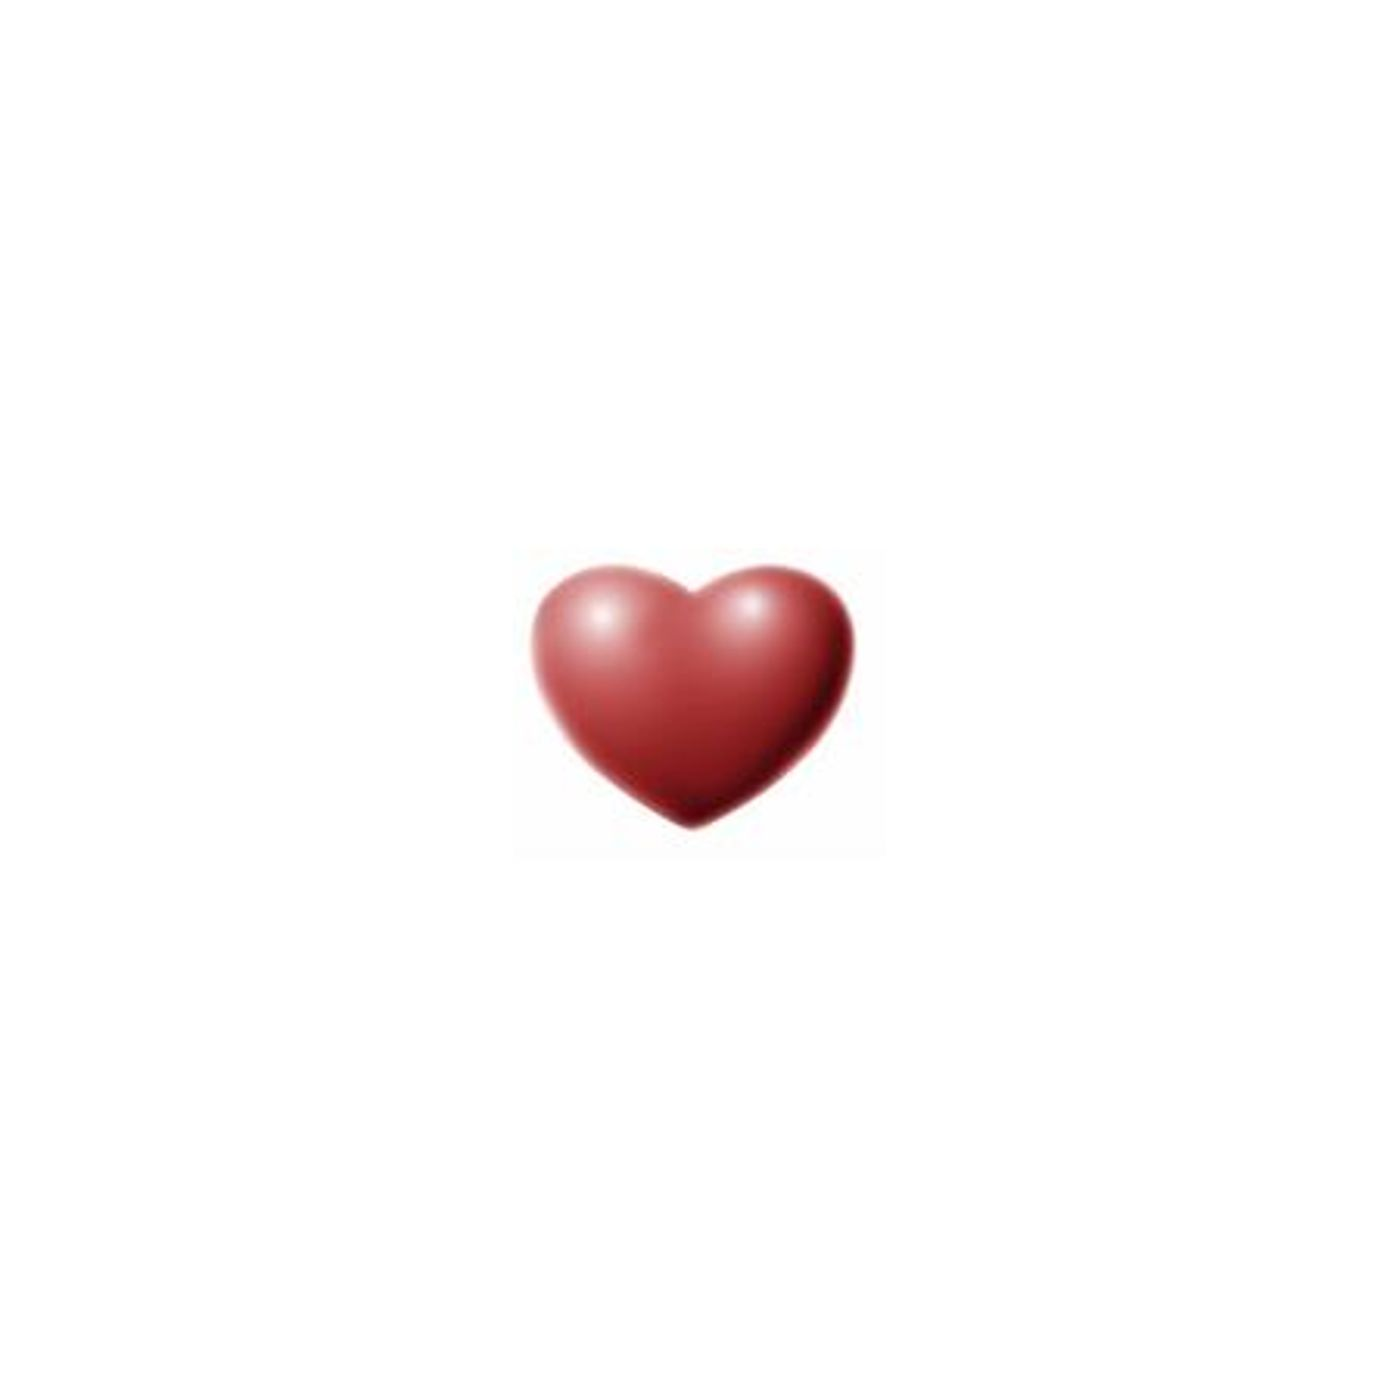 WEDNESDAY HOODOO LOVE READINGS